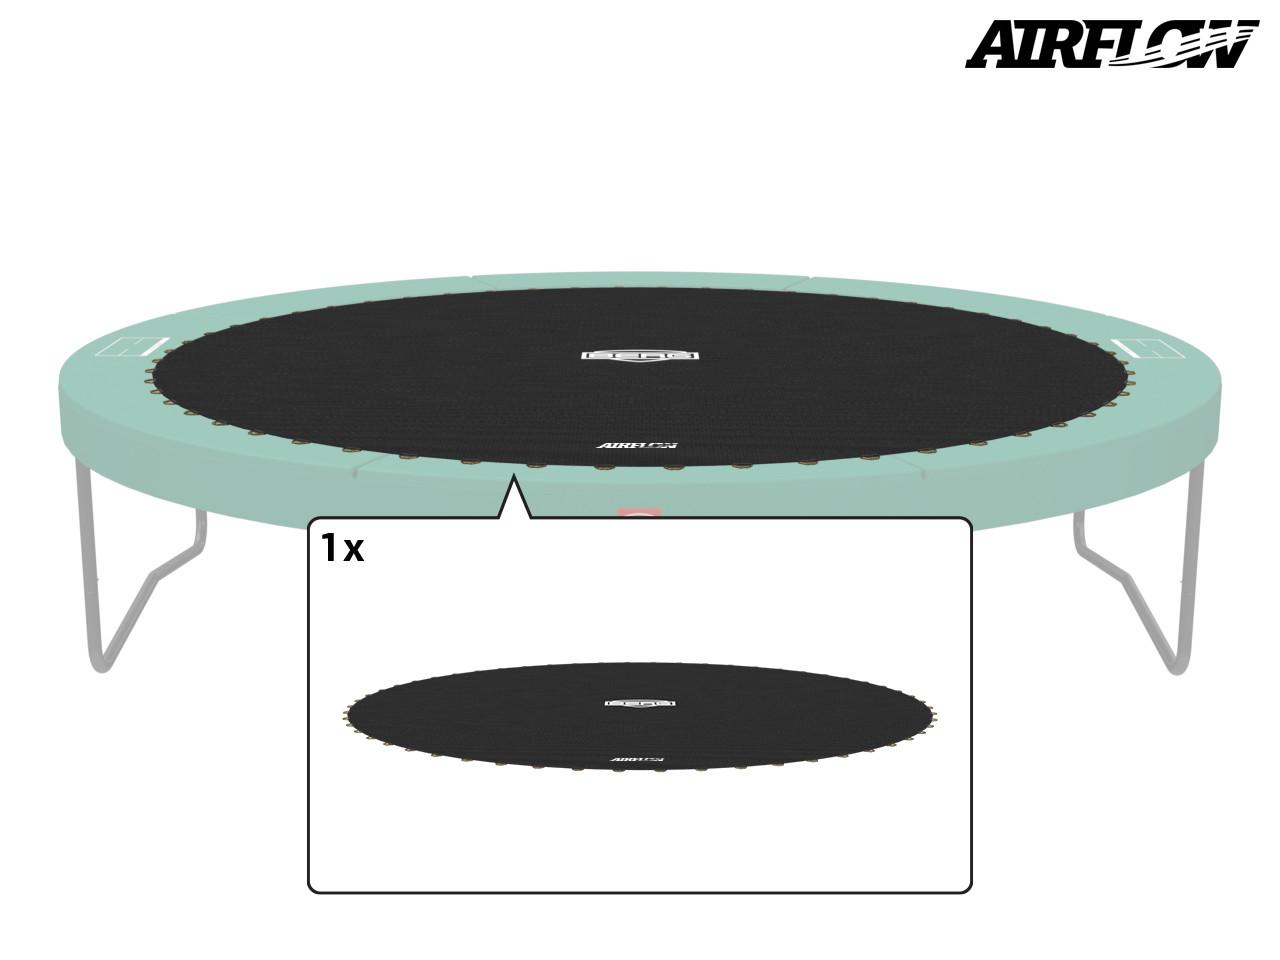 Champion - Jump mat 380 (12,5ft) (TwinSpring, AIRFLOW)